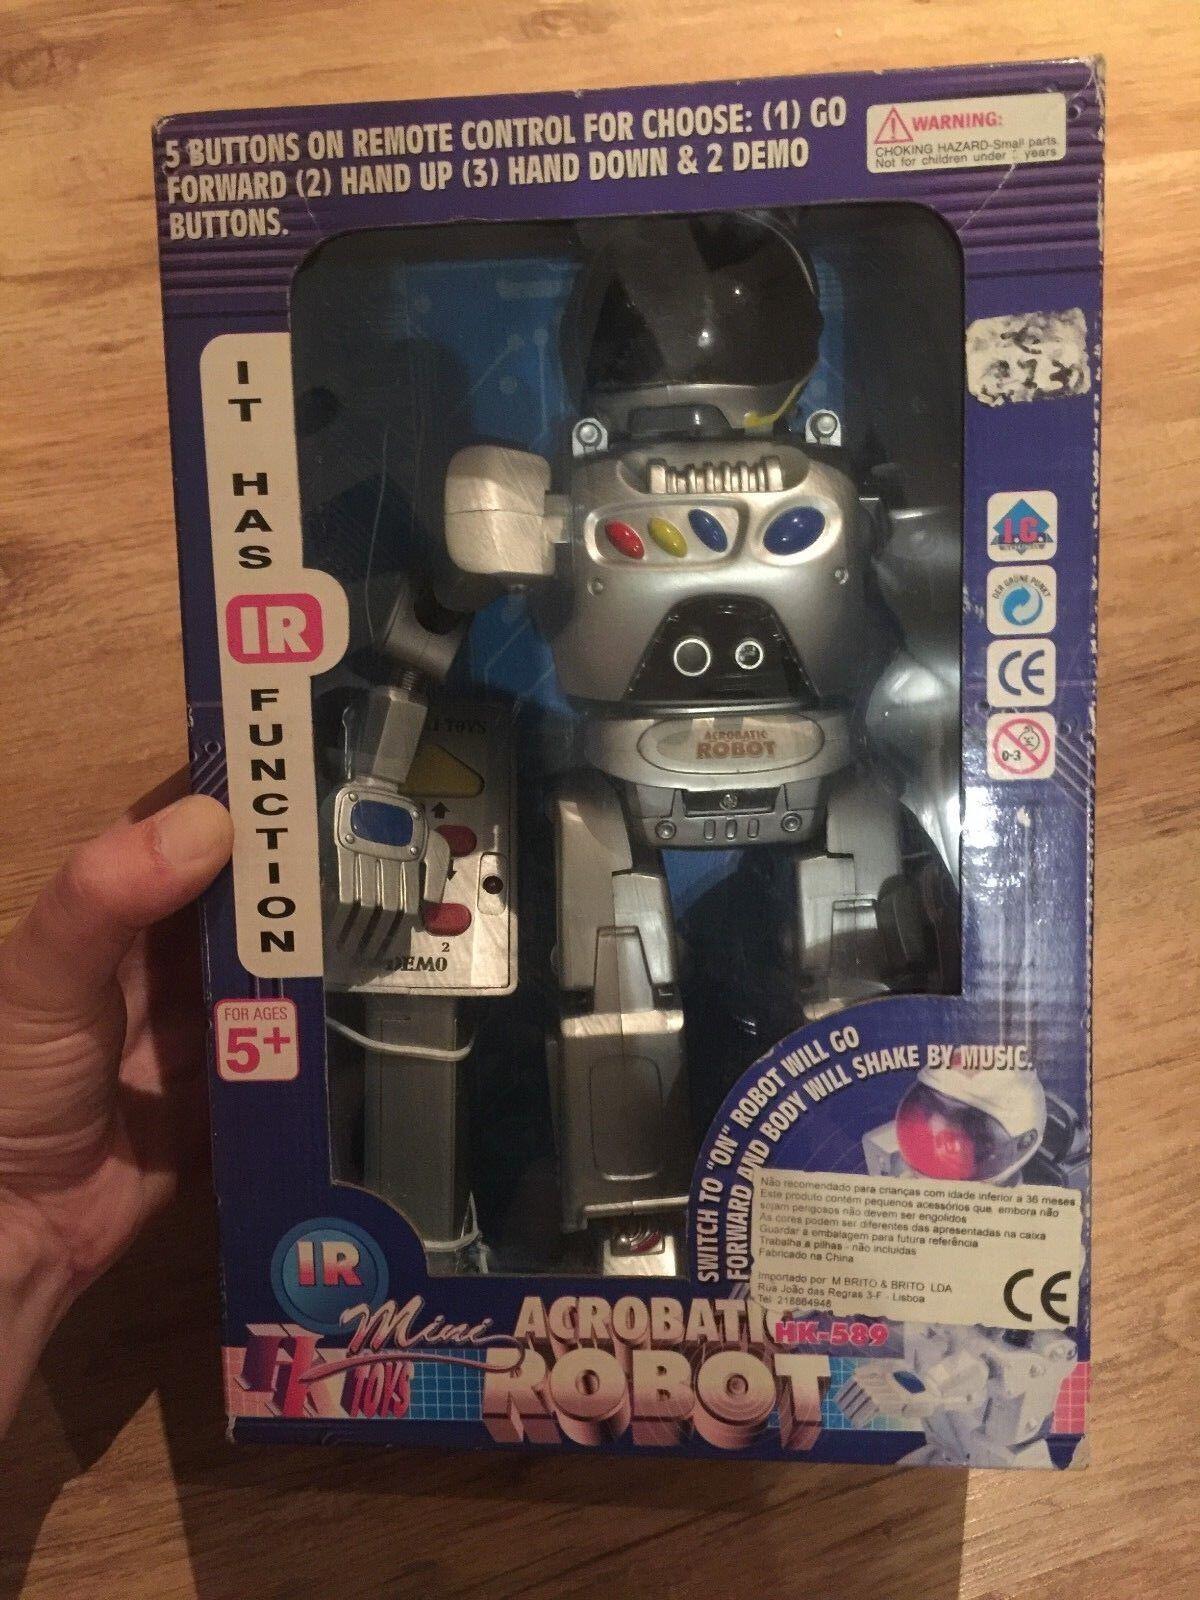 ACROBATIC ROBOT HK589 Med fjärrstyrning - ORIGINAL HO KAY leksaker